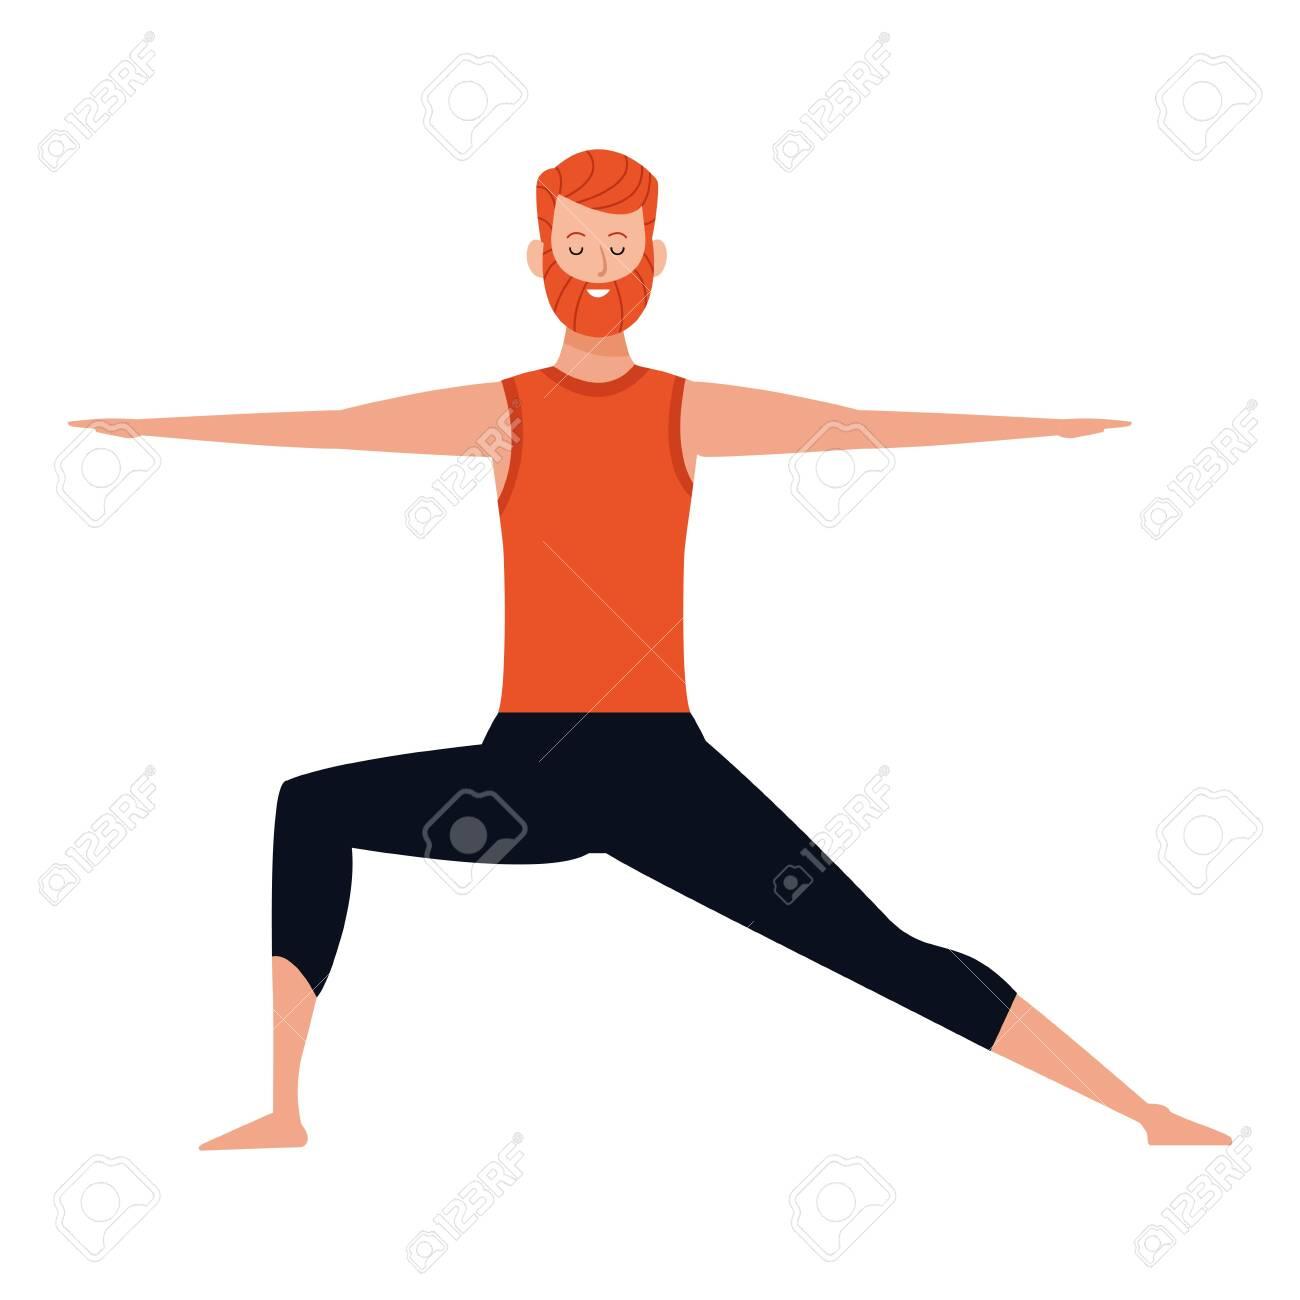 Man Yoga Pose Avatar Cartoon Character Vector Illustration Graphic Royalty Free Cliparts Vectors And Stock Illustration Image 124704141